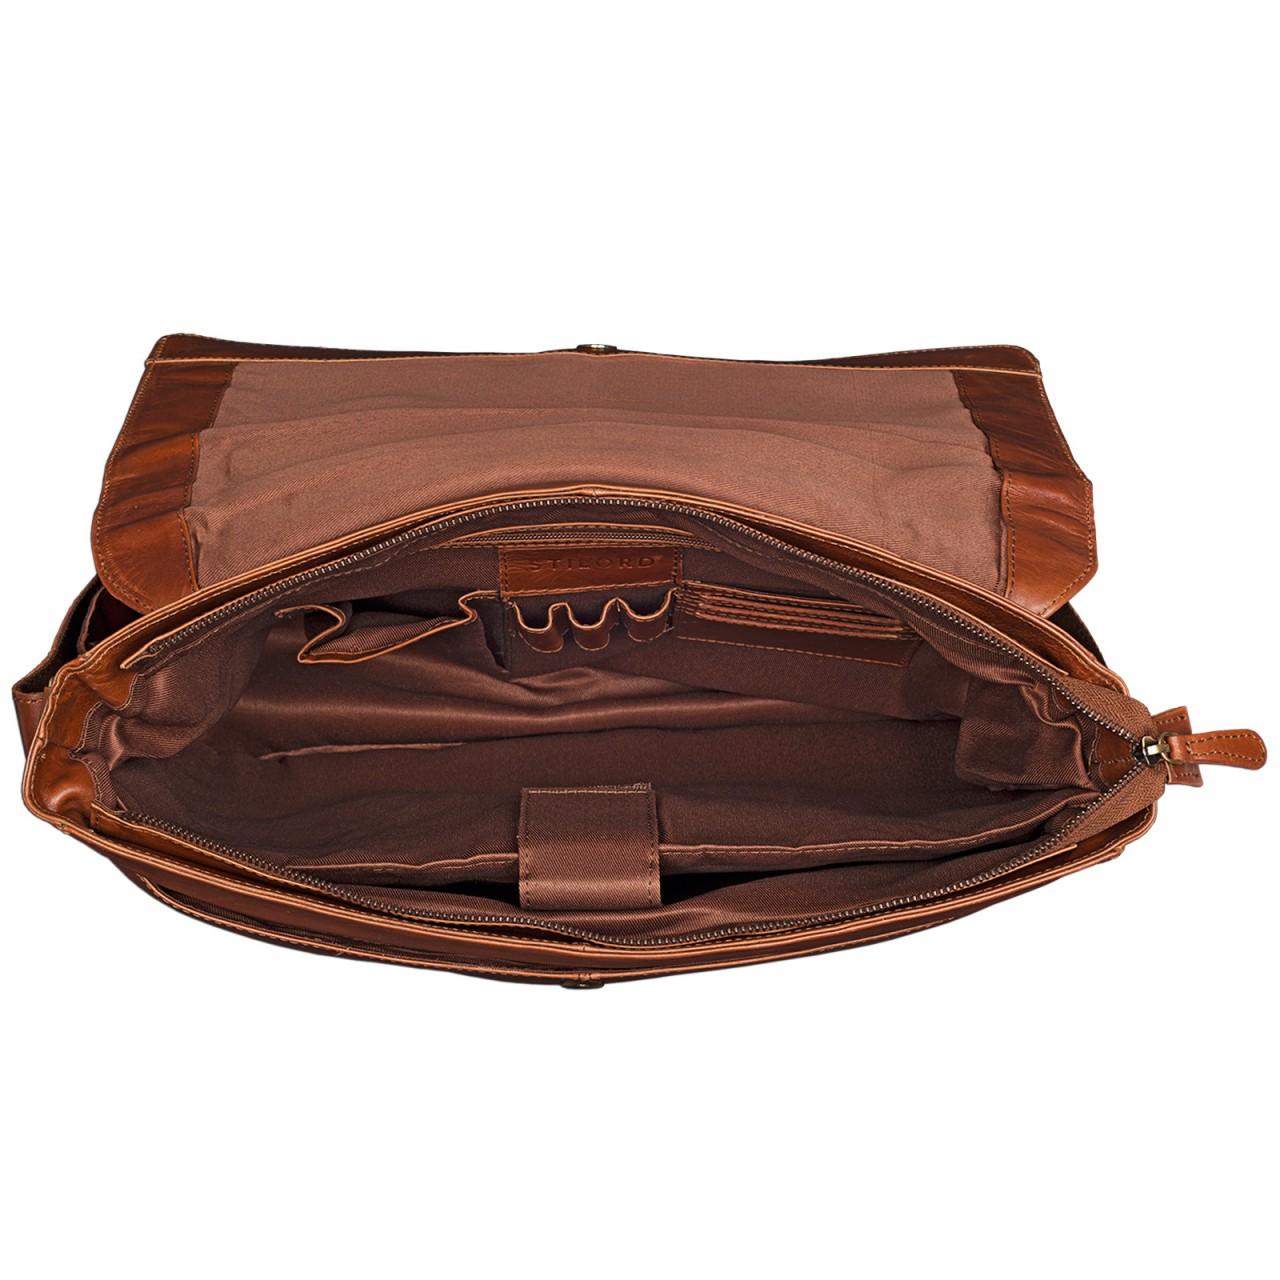 STILORD Leder Bürotasche mit 15,6 Zoll Laptopfach Dokumententasche Vintage Umhängetasche DIN A4 Akten Business Cognac Braun Glänzend - Bild 6